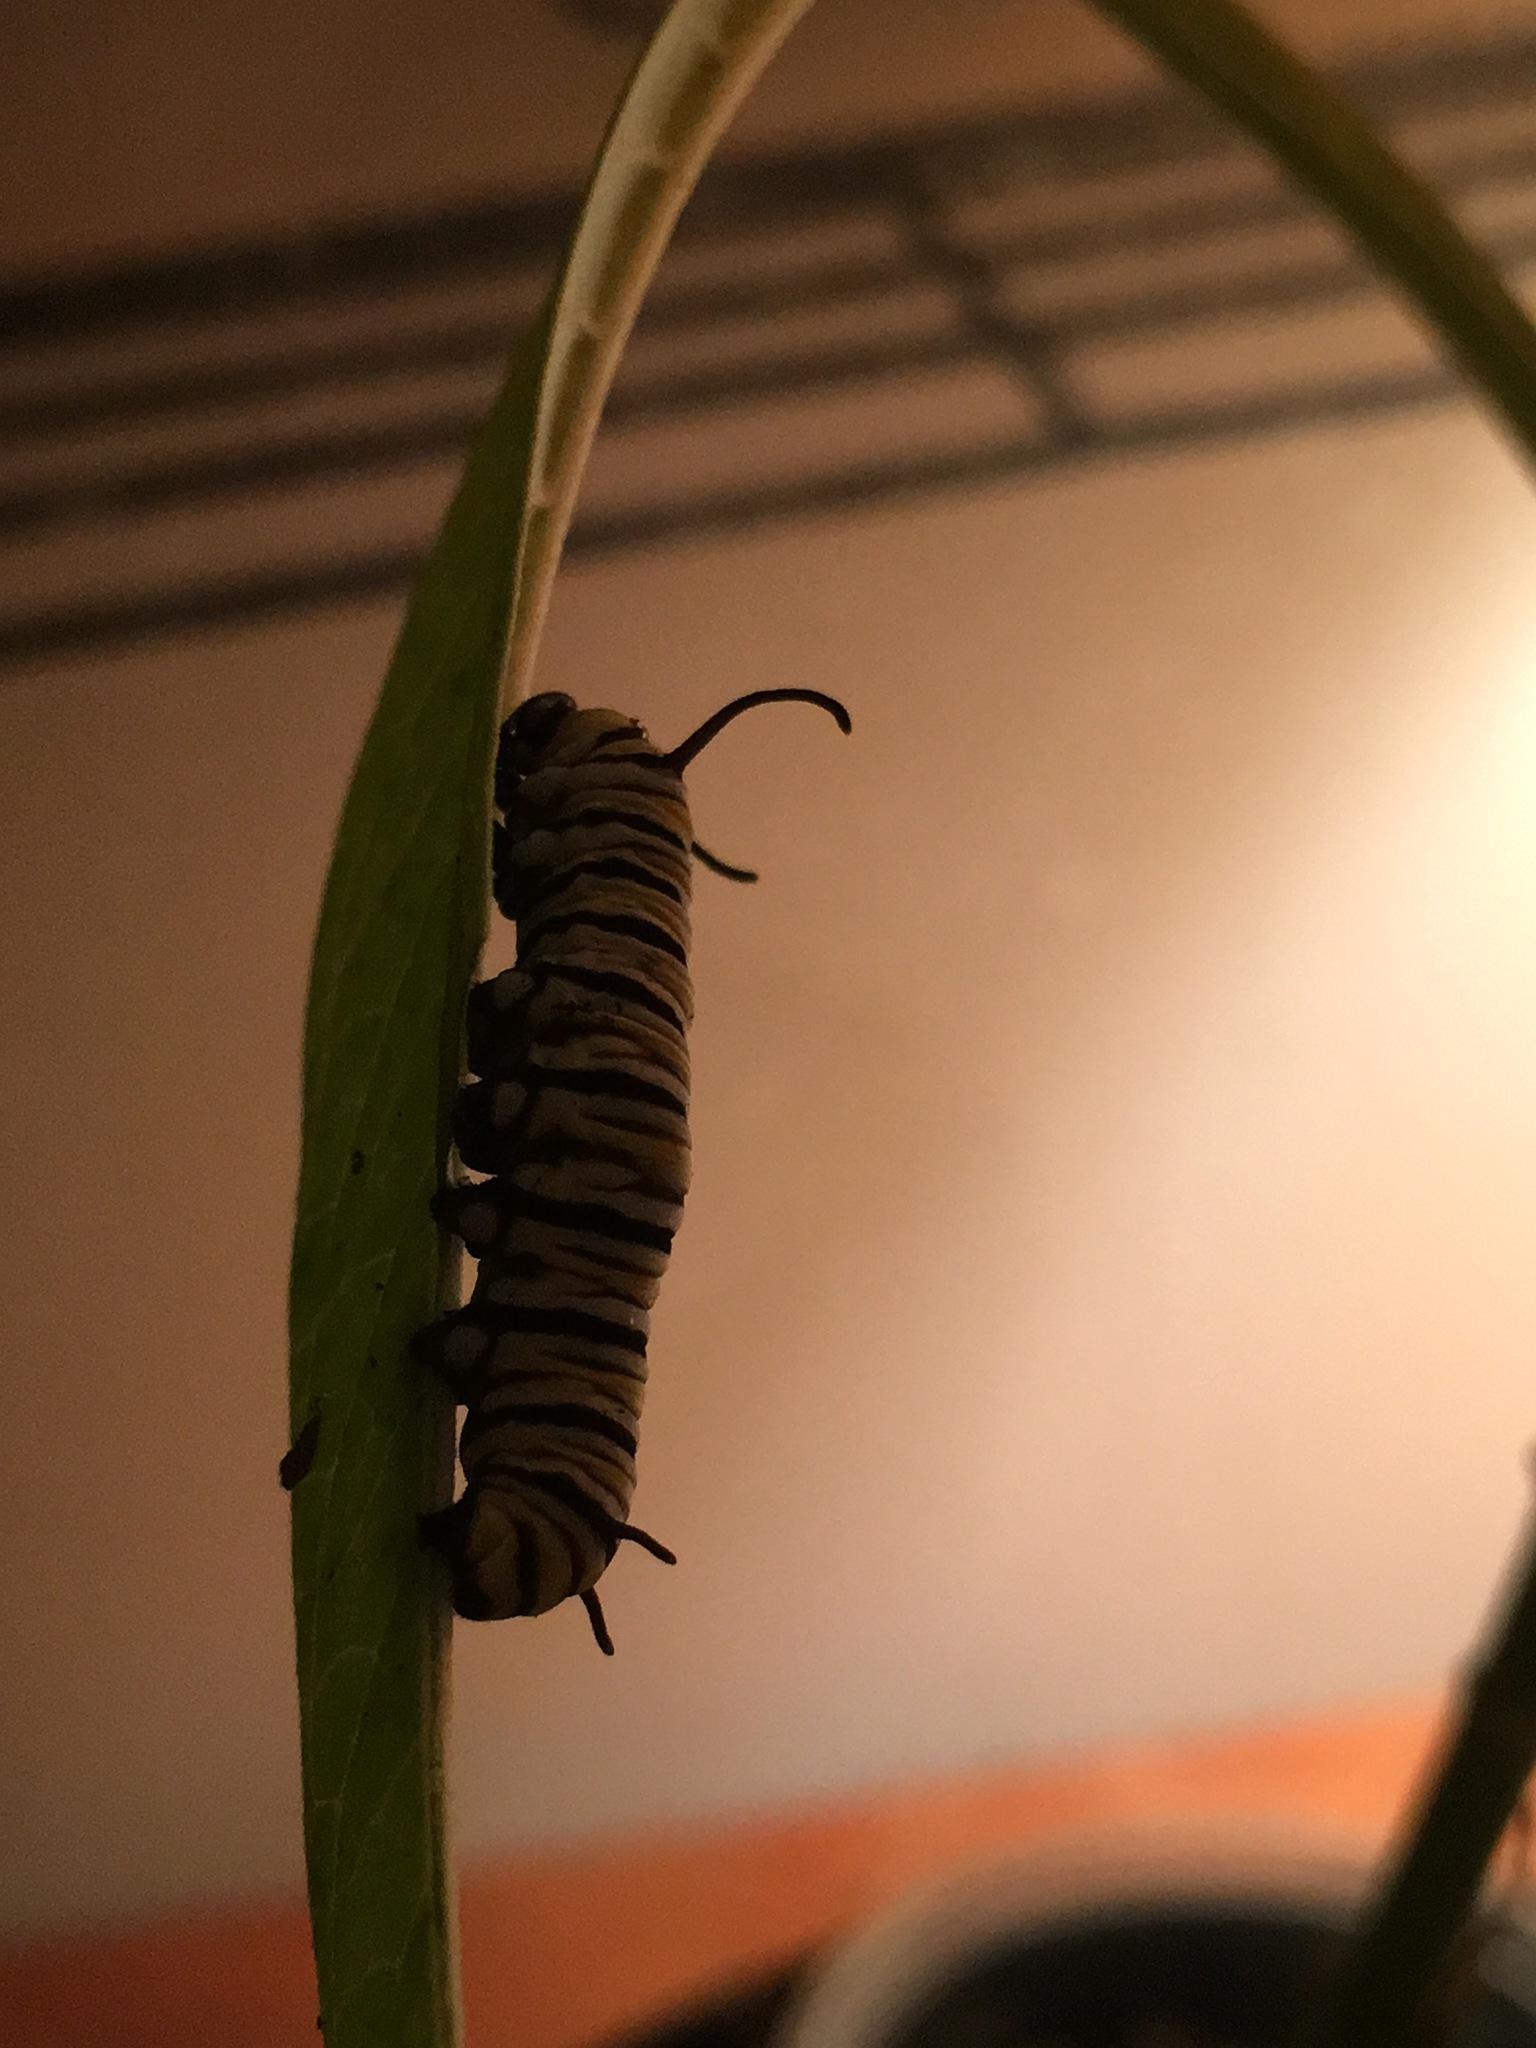 Evening  with caterpillars  by pamela.kanarr